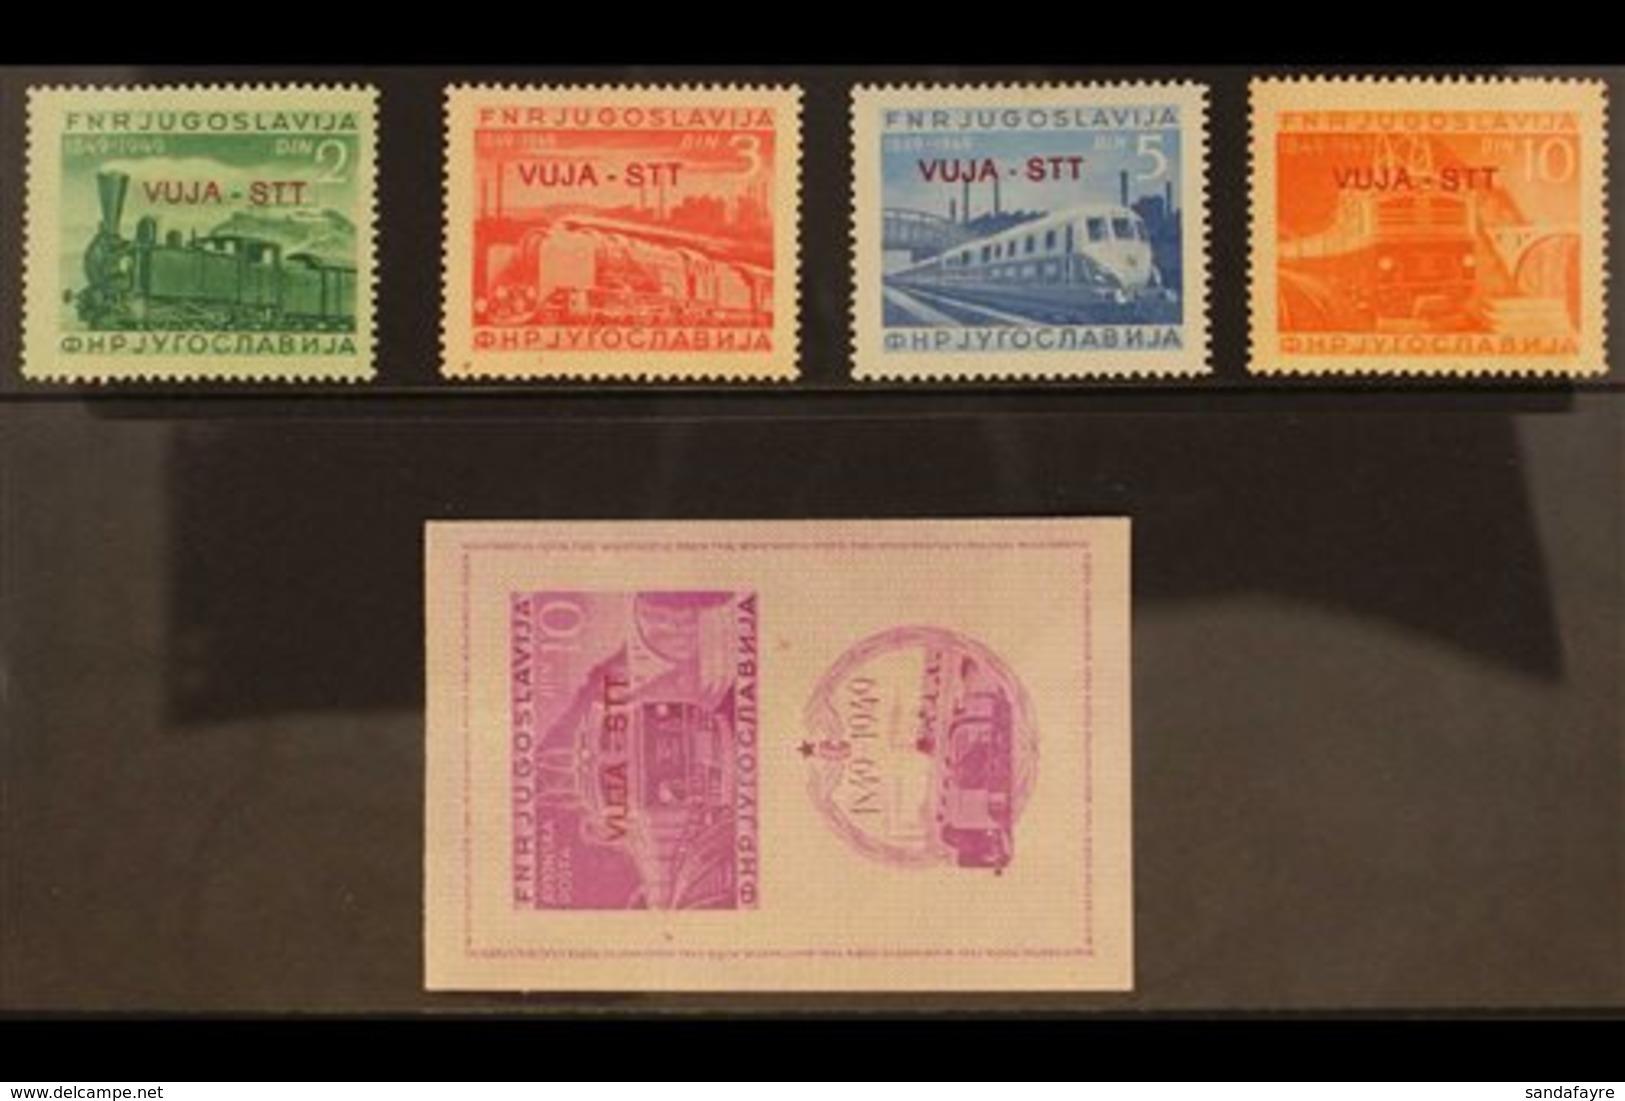 "ZONE B 1950 Railway Centenary Set Plus Imperf Miniature Sheet, Overprinted ""VUJA - STT"" In Red, SG B33/B36 Plus MS B36Ba - Trieste"